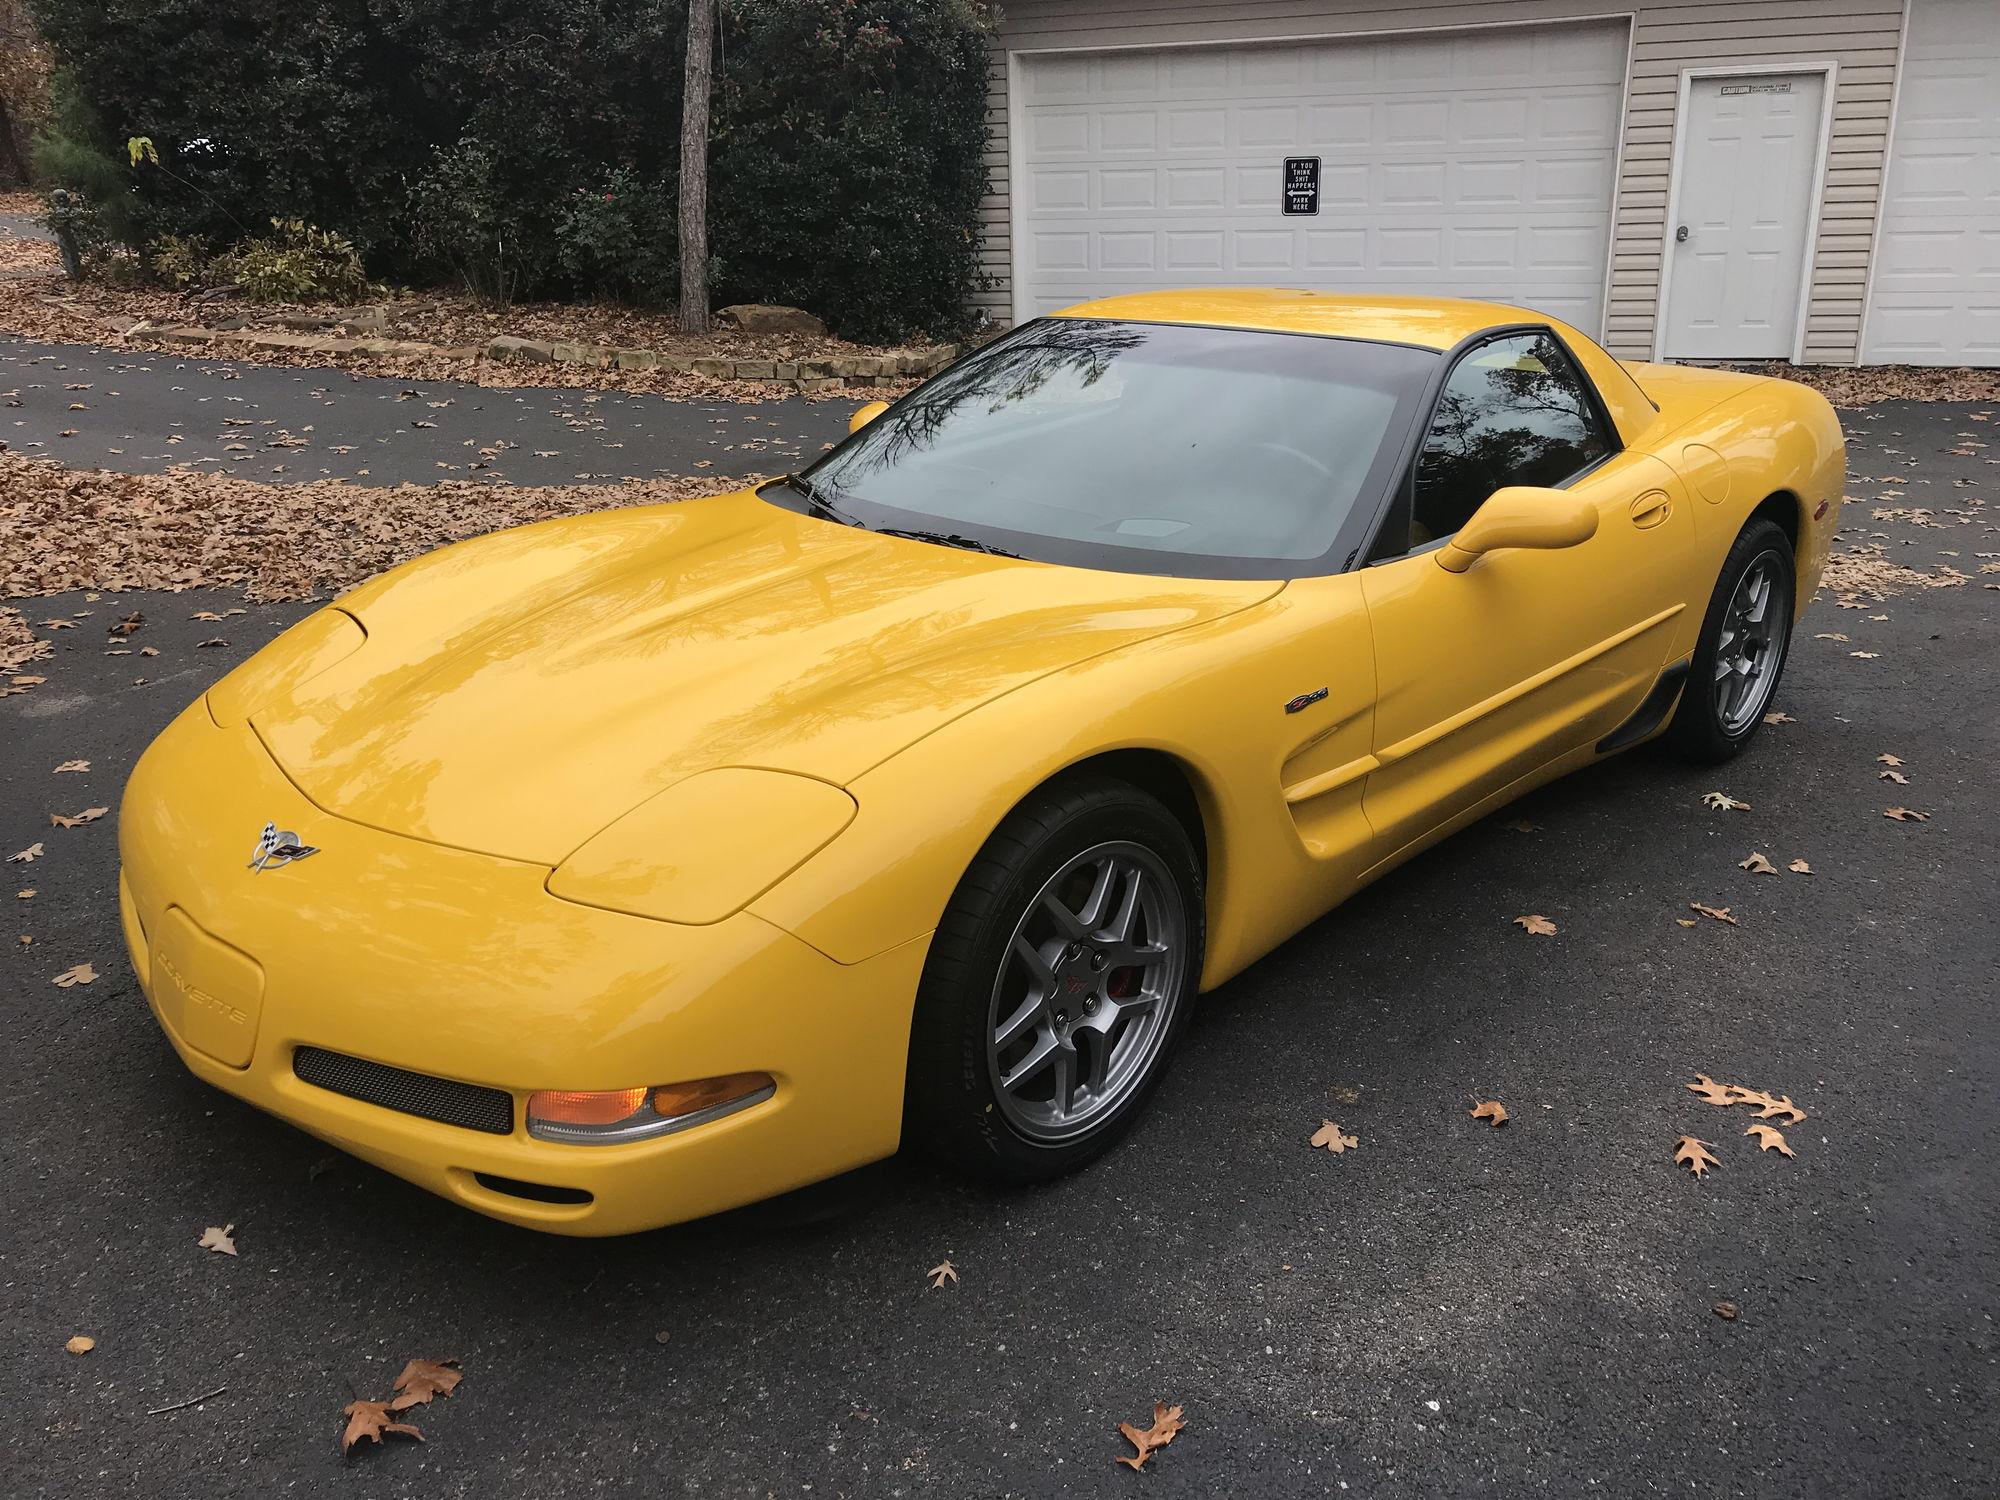 fs for sale 2003 zo6 1916 miles corvetteforum chevrolet corvette forum discussion. Black Bedroom Furniture Sets. Home Design Ideas